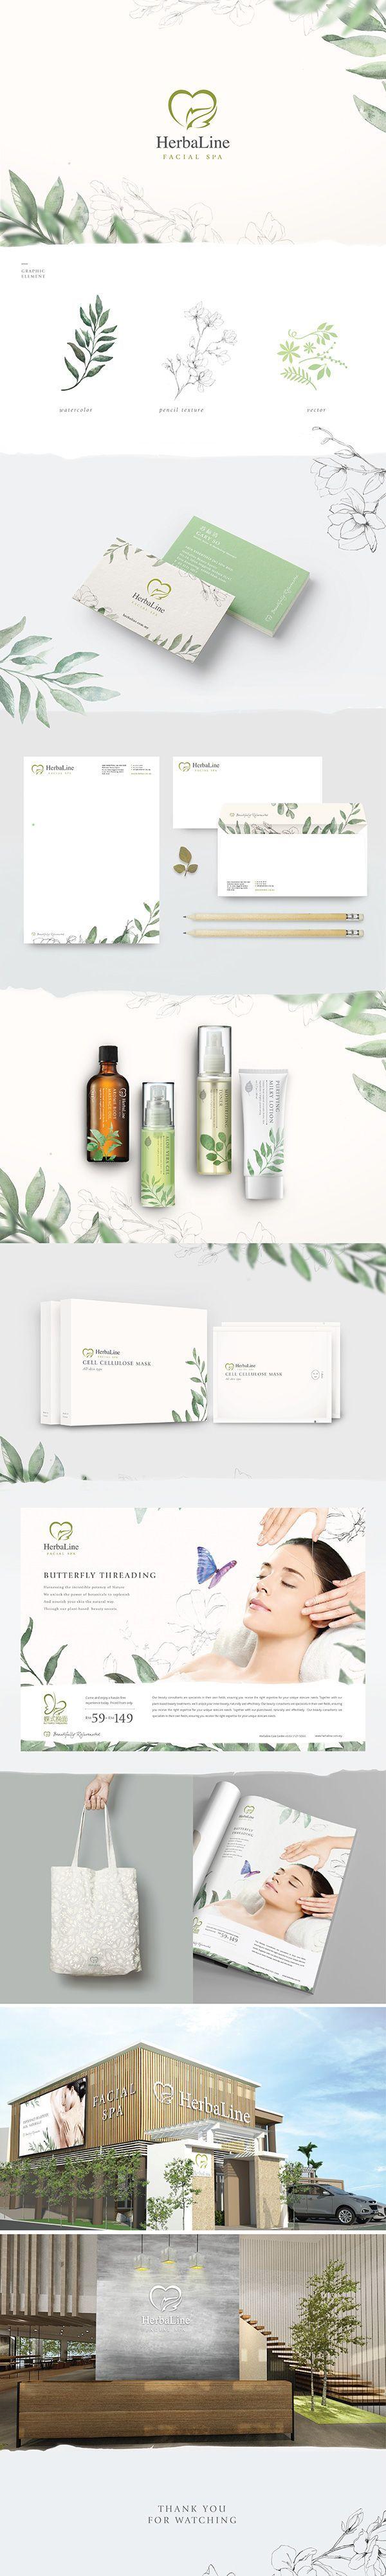 Herbal branding